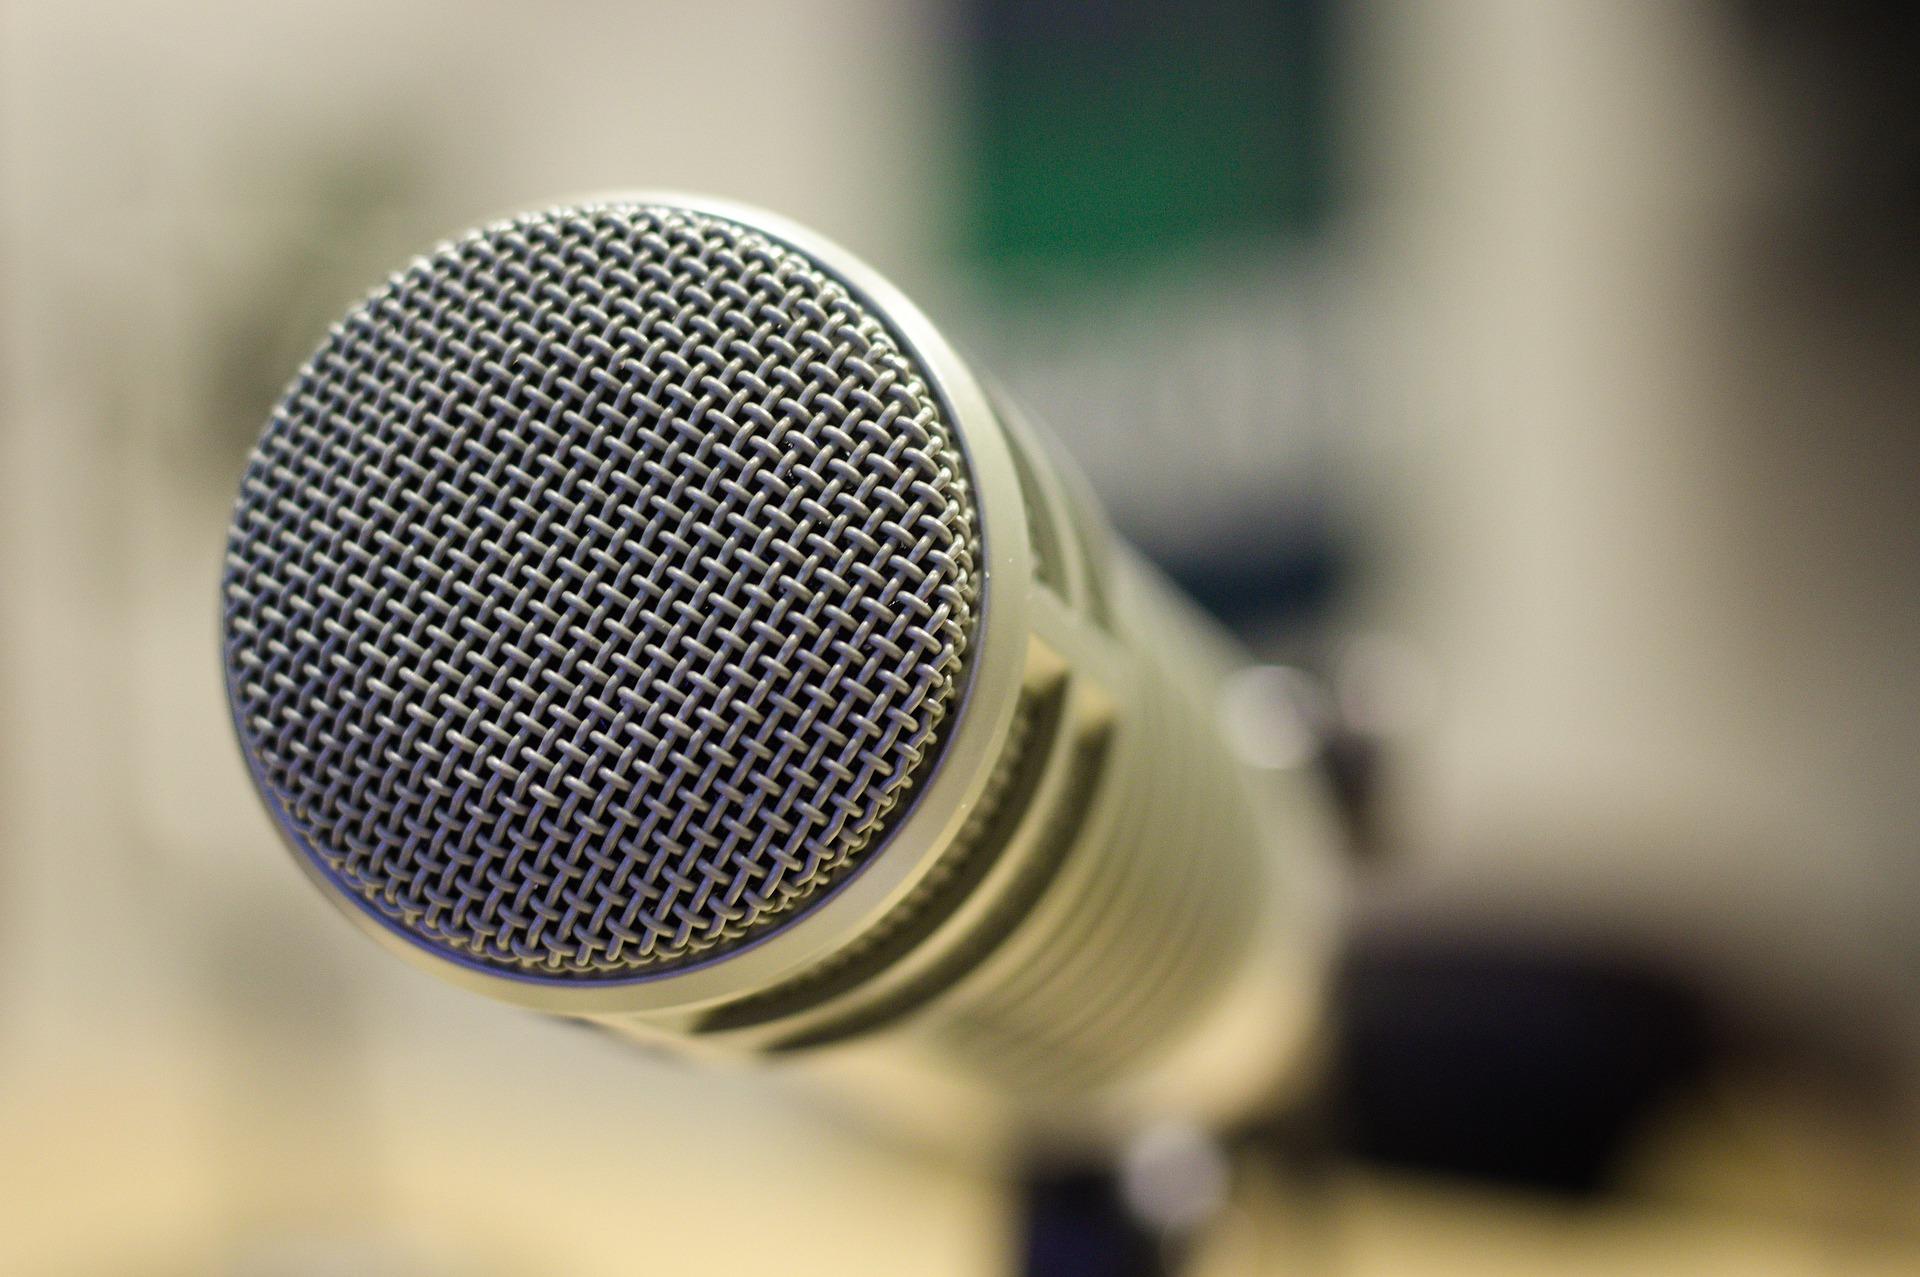 mic-4250217_1920